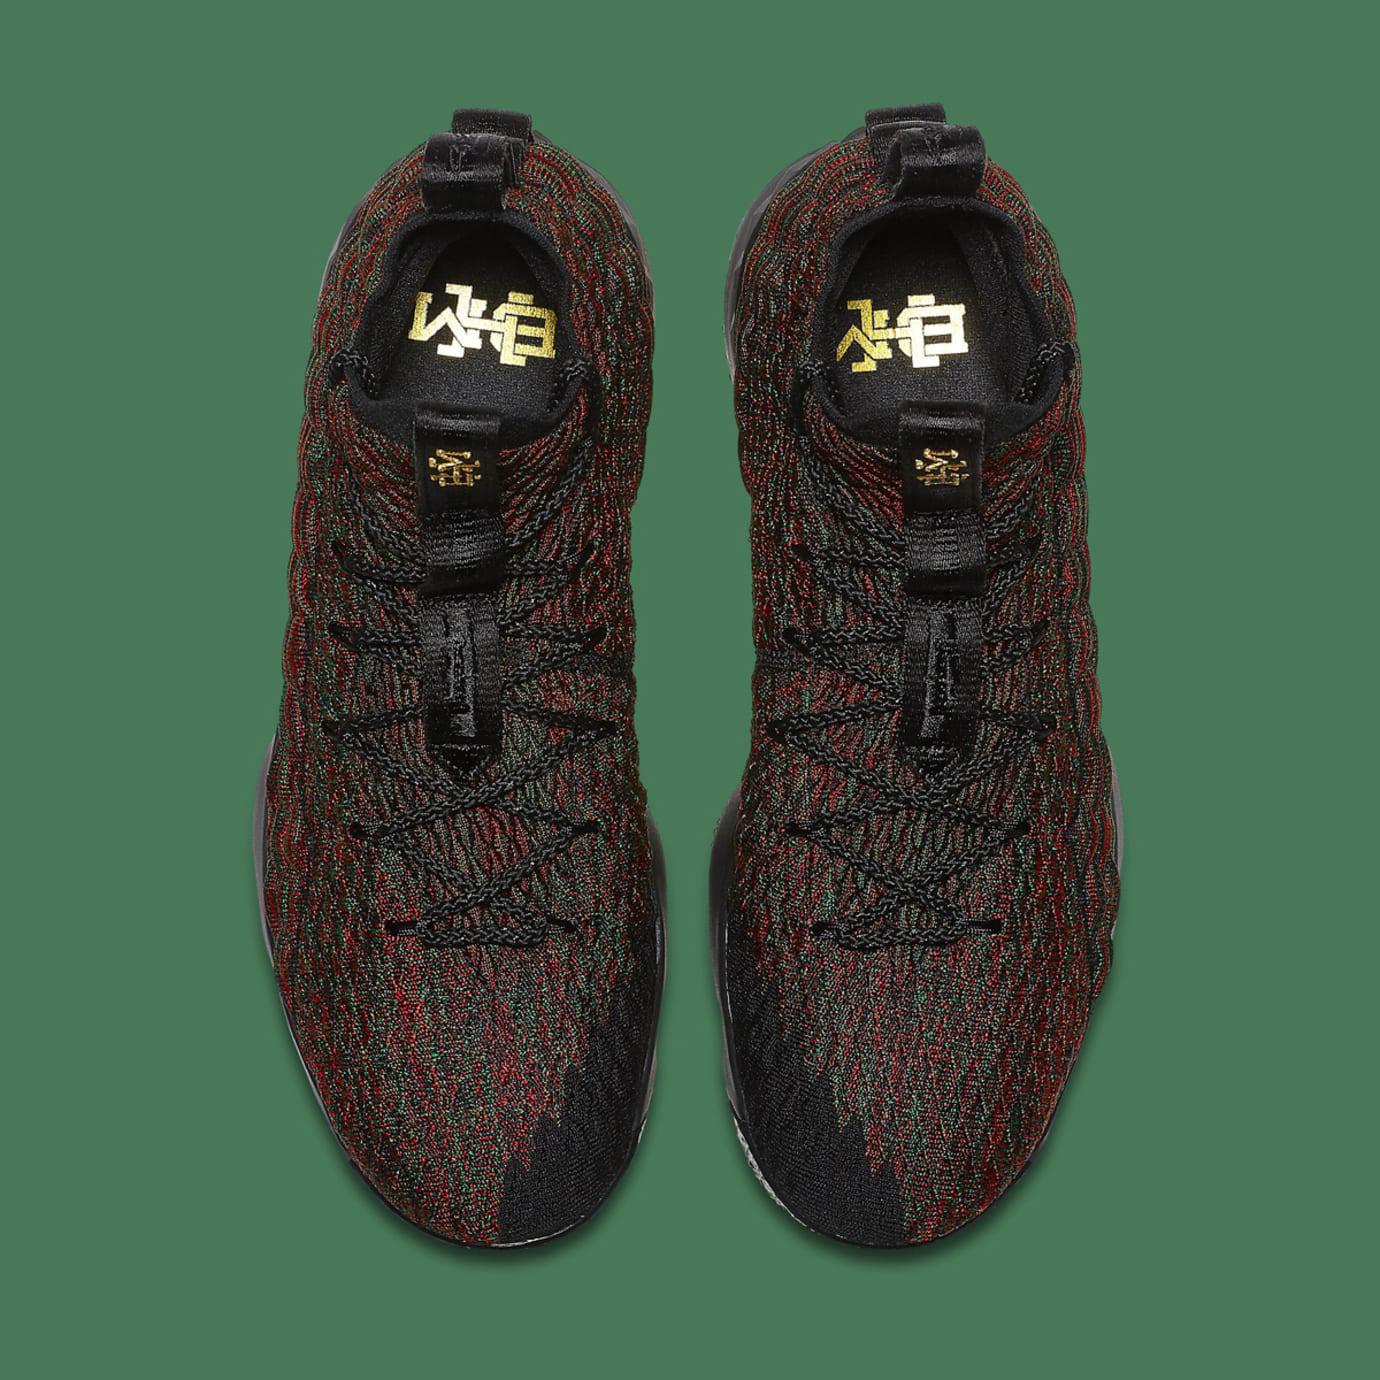 official photos 5020f 05f4a Image via Nike Nike LeBron 15 BHM AA3857-900